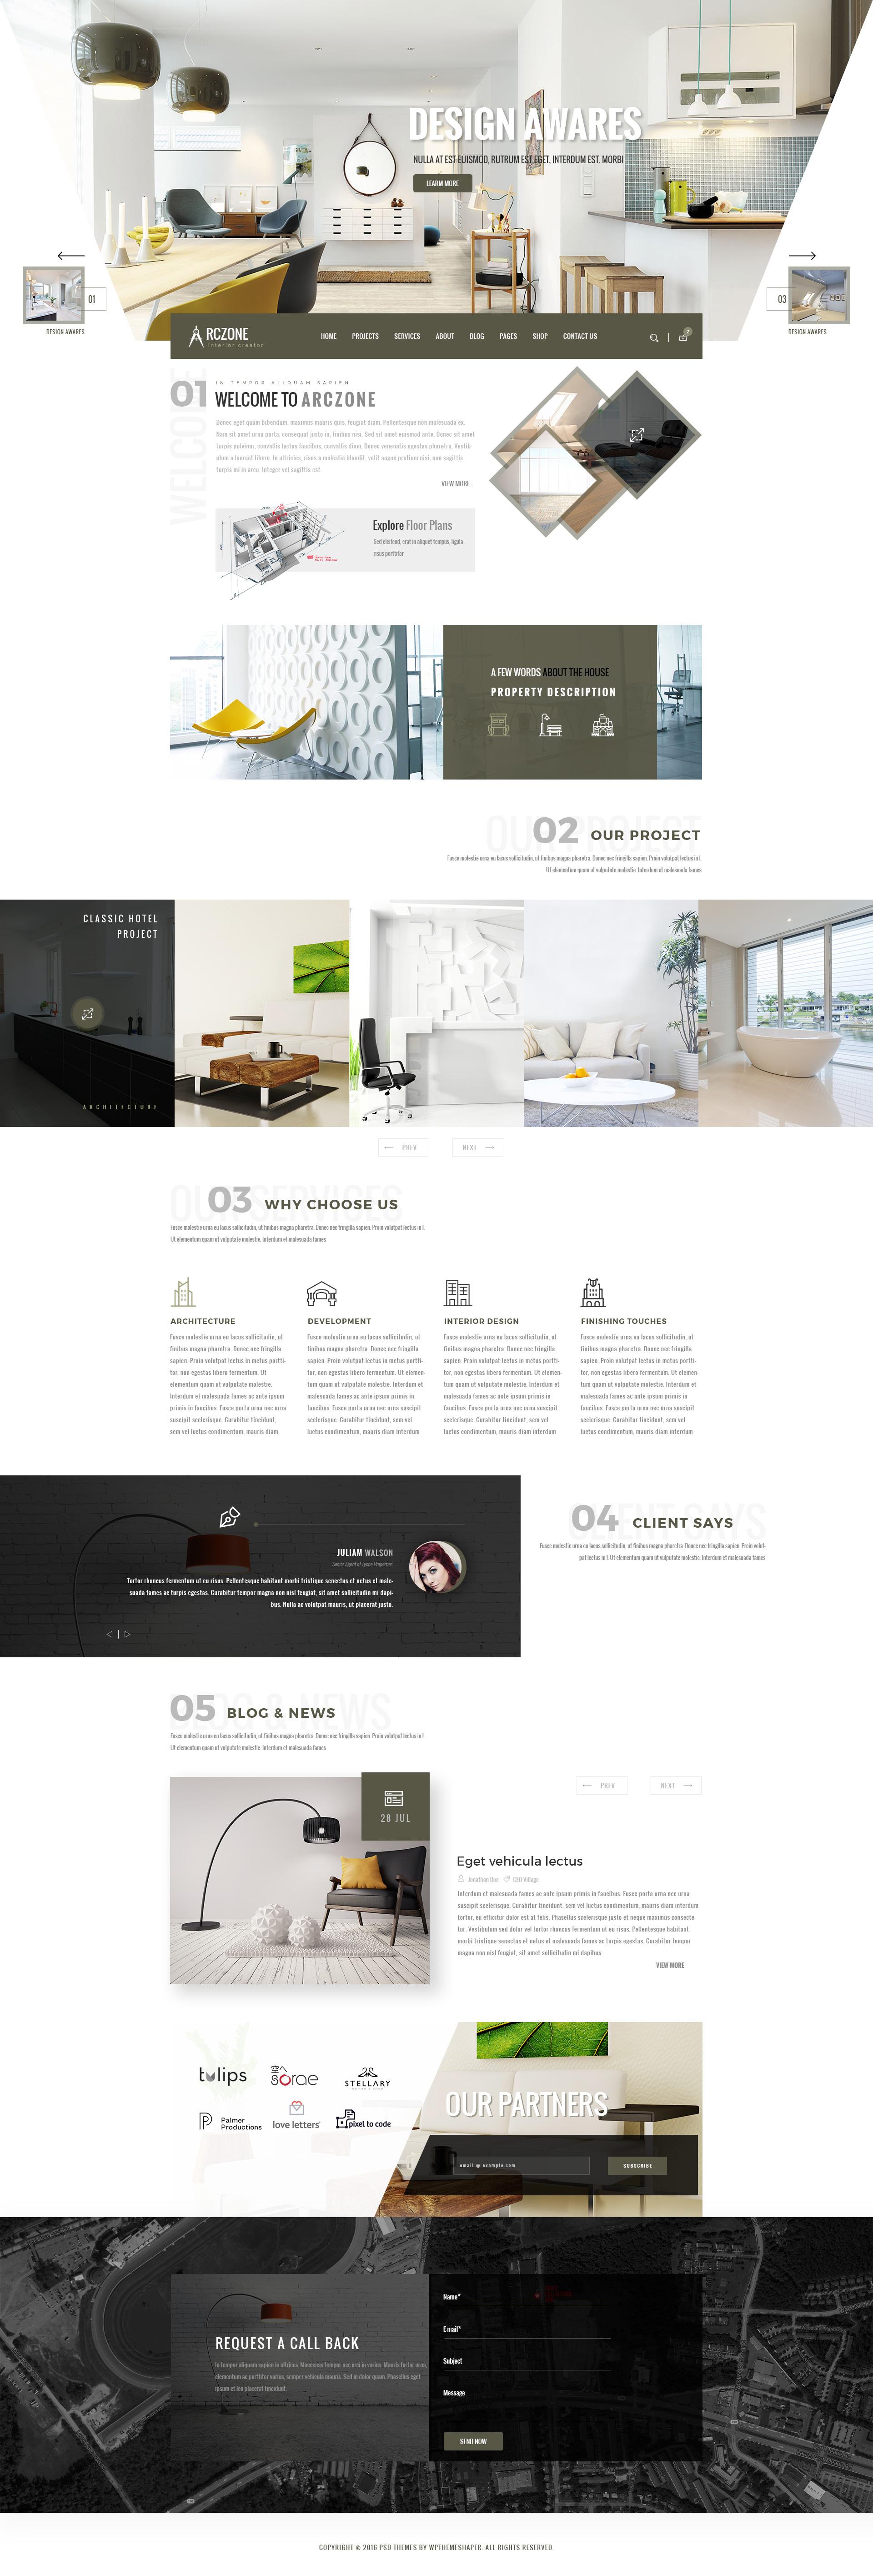 ARCZONE Interior Design Decor Architecture Business Template by